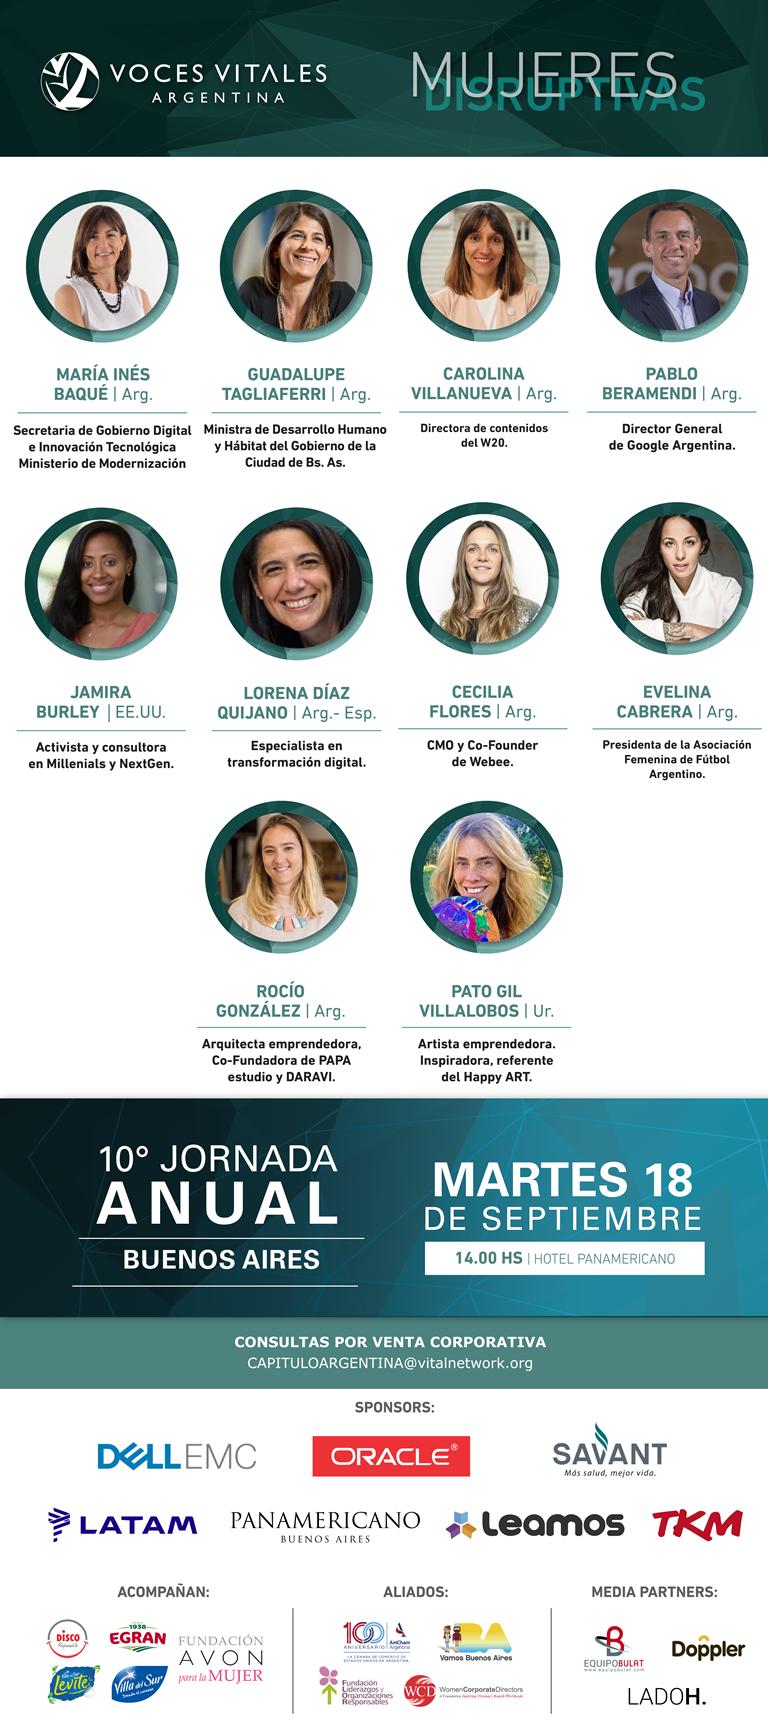 Jornada Anual 2018